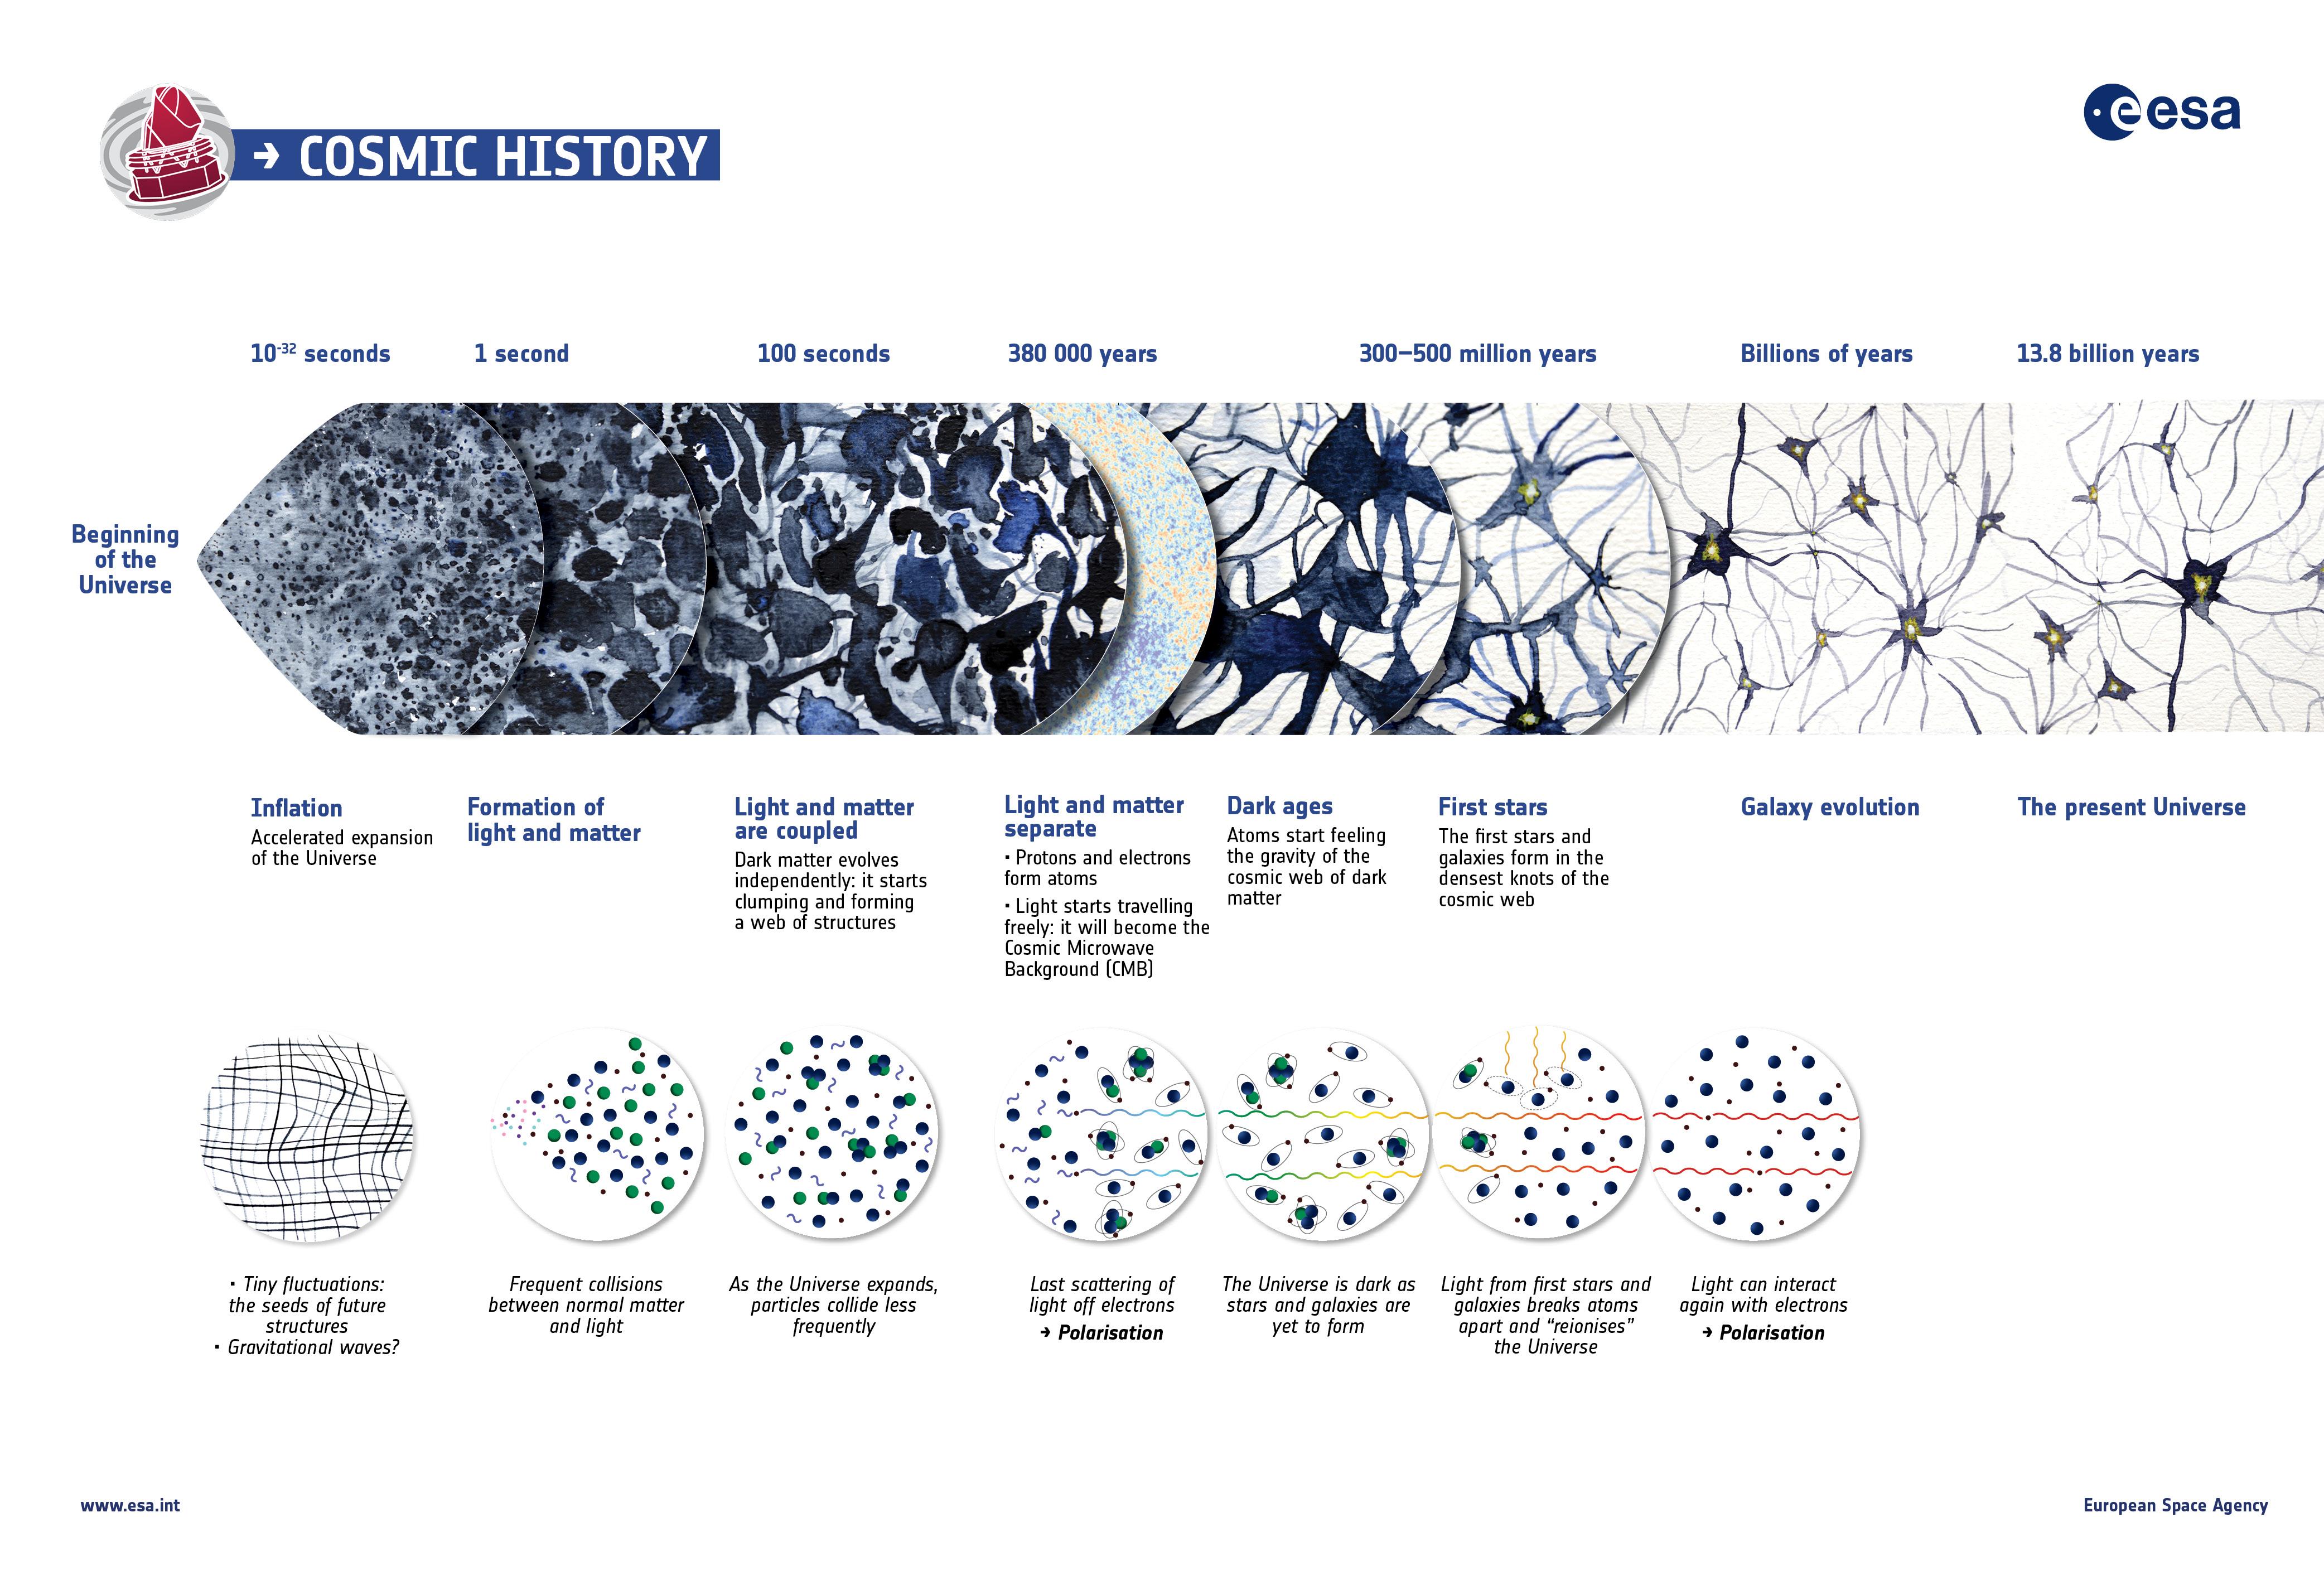 1567216028299-ESA_Planck_CosmicHistory_Infographic.jpg